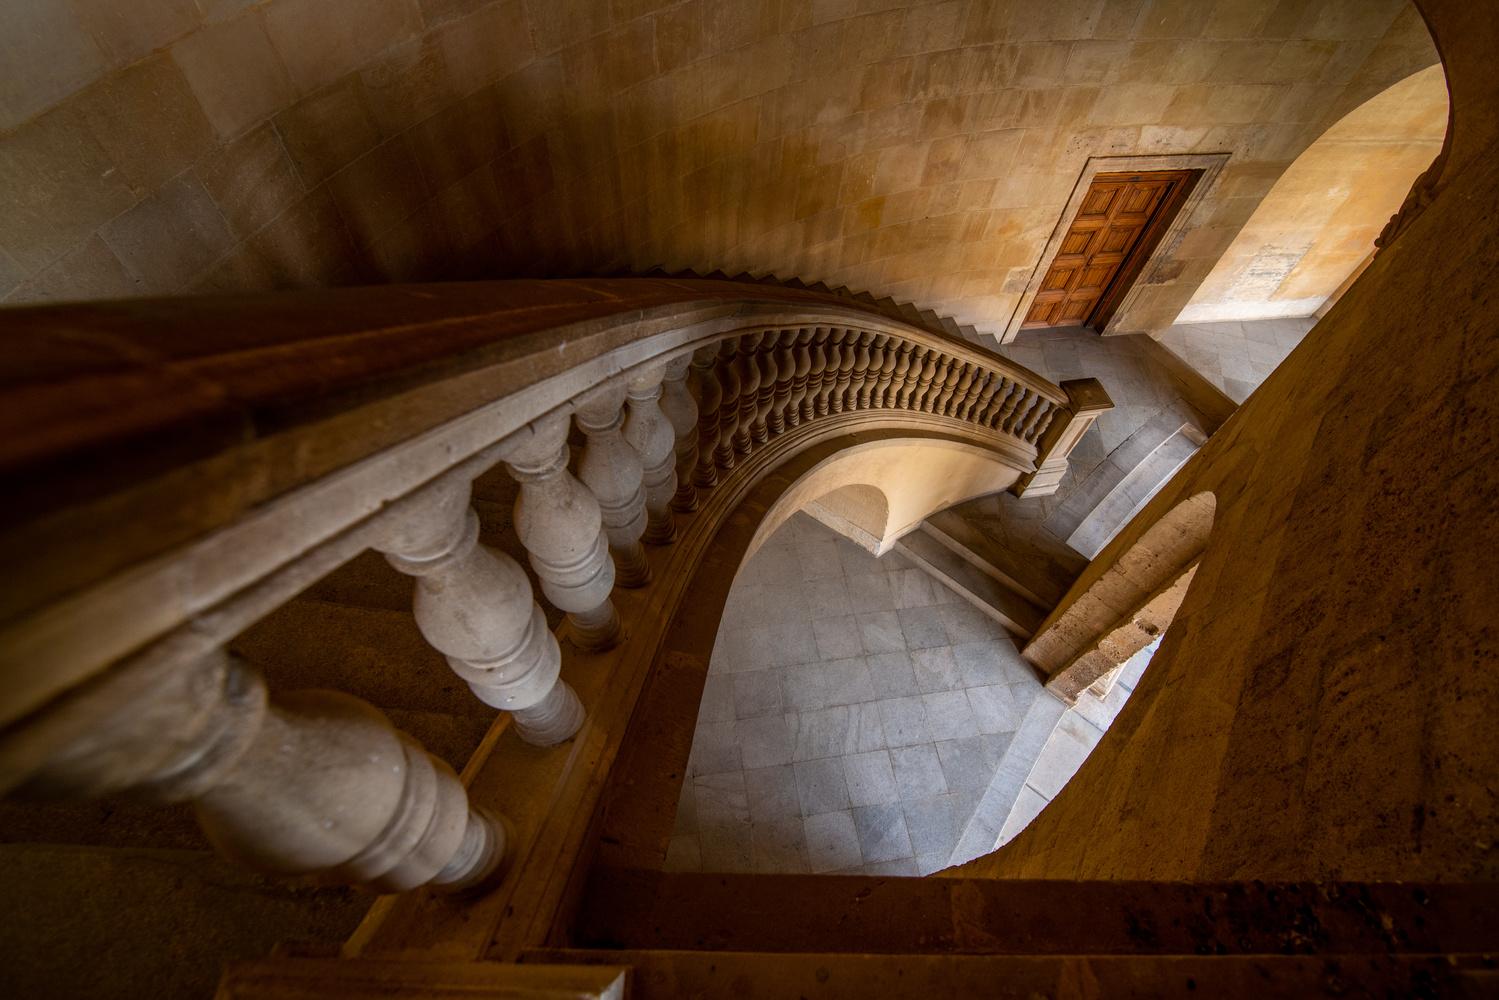 Just stairs by Matthijs Bettman